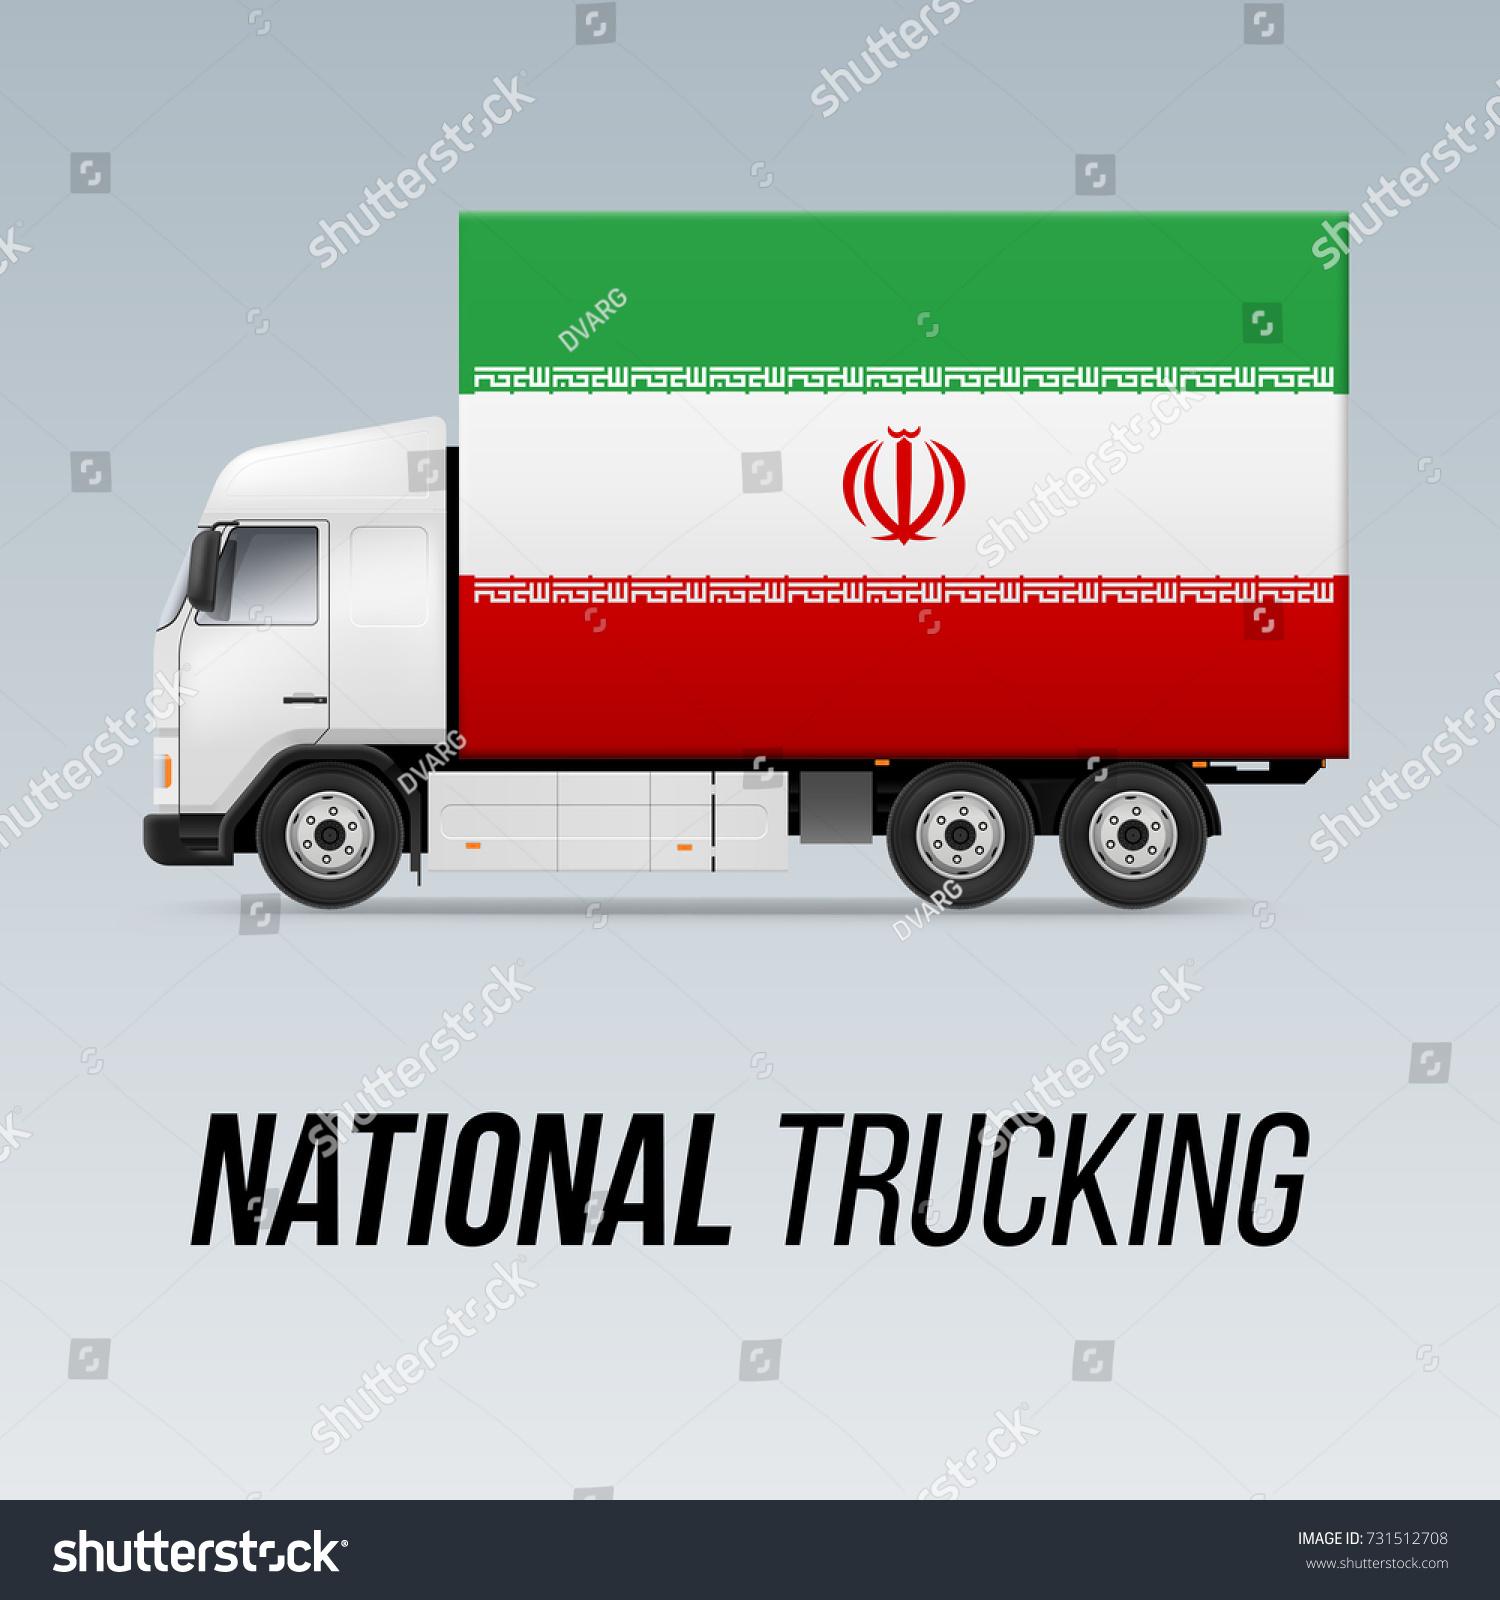 Symbol national delivery truck flag iran stock vector 731512708 symbol of national delivery truck with flag of iran national trucking icon and iranian flag buycottarizona Choice Image